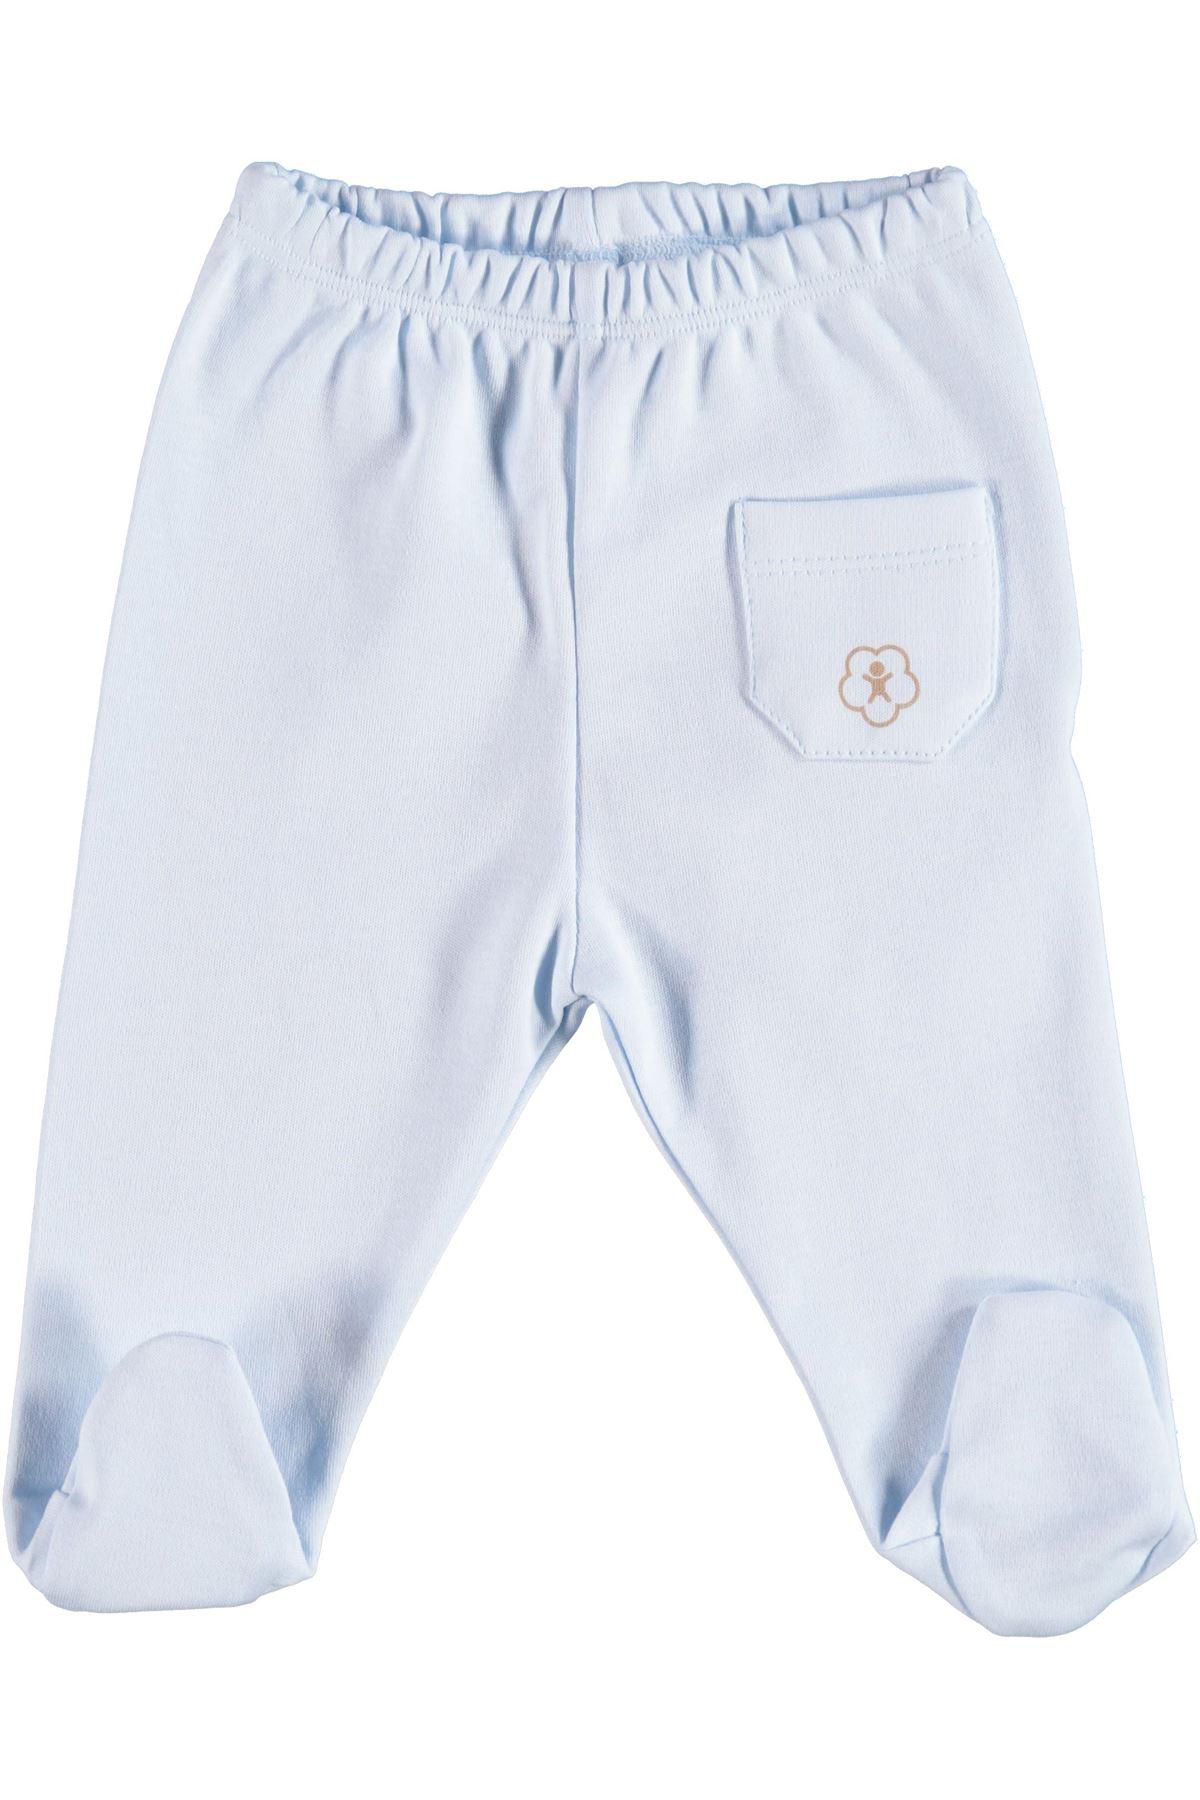 Bibaby Basic Patikli Pantolon 57499 Mavi